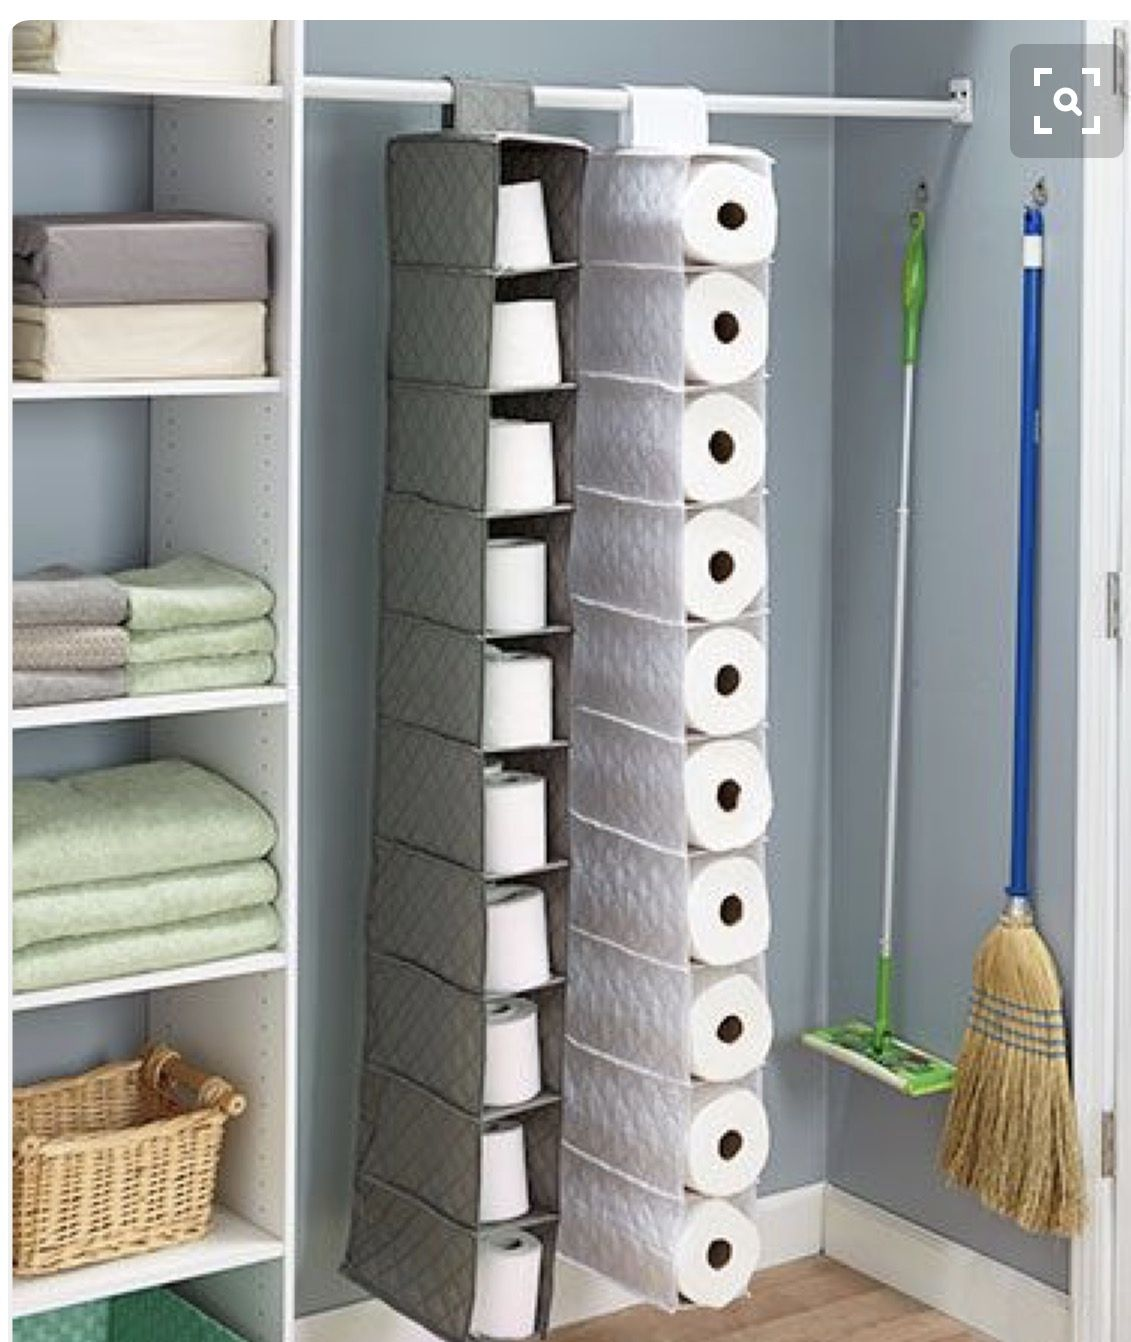 Bulk Paper Towel Or Tp Storage Idea Diy Toilet Paper Holder